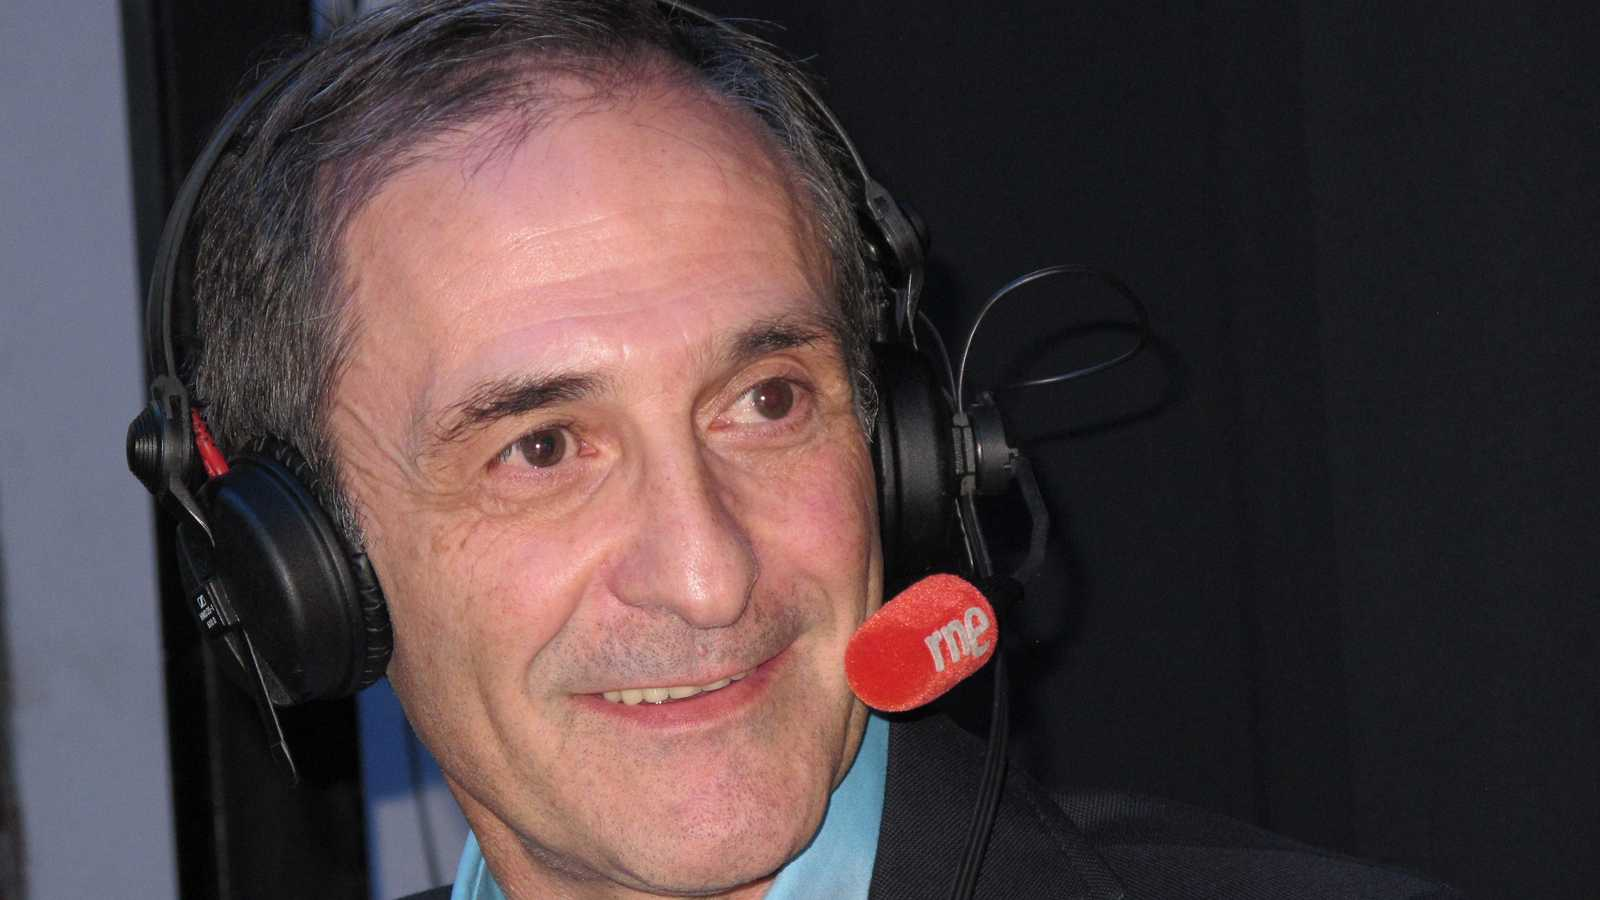 Entrevista David Rodríguez - Escuchar ahora